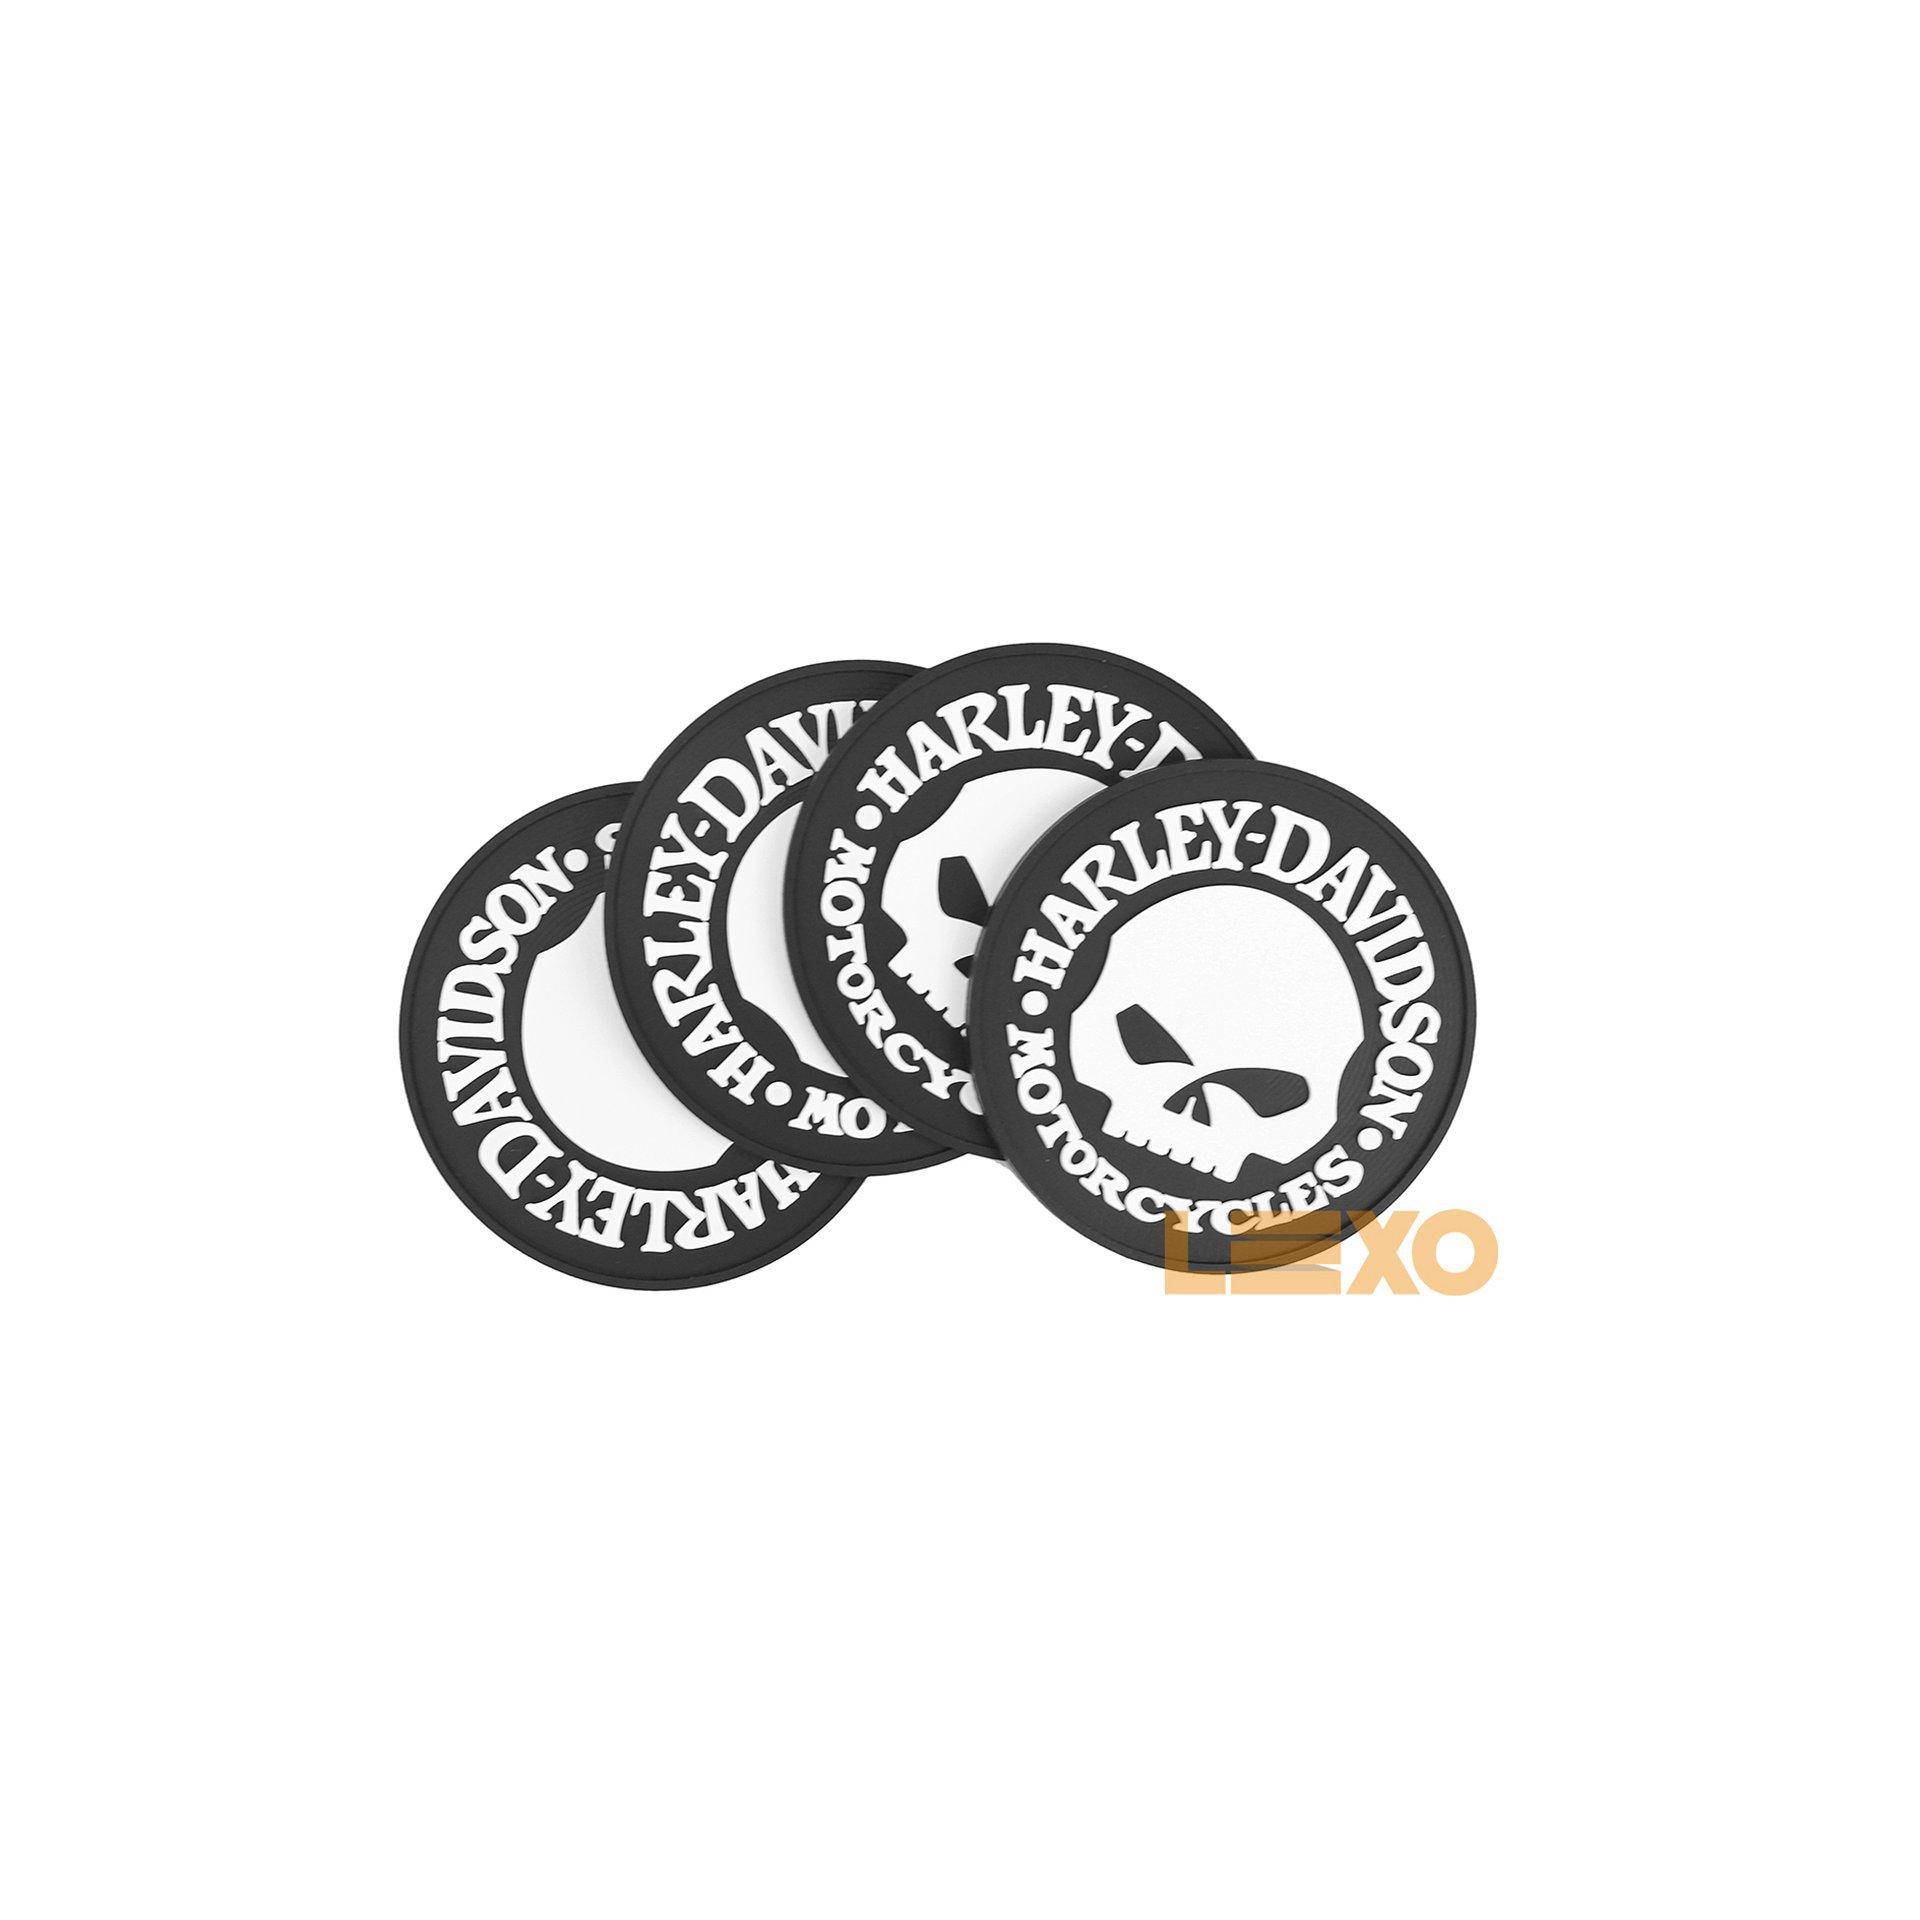 Porta Copo Emborrachado Harley Davidson Caveira - Bar Light